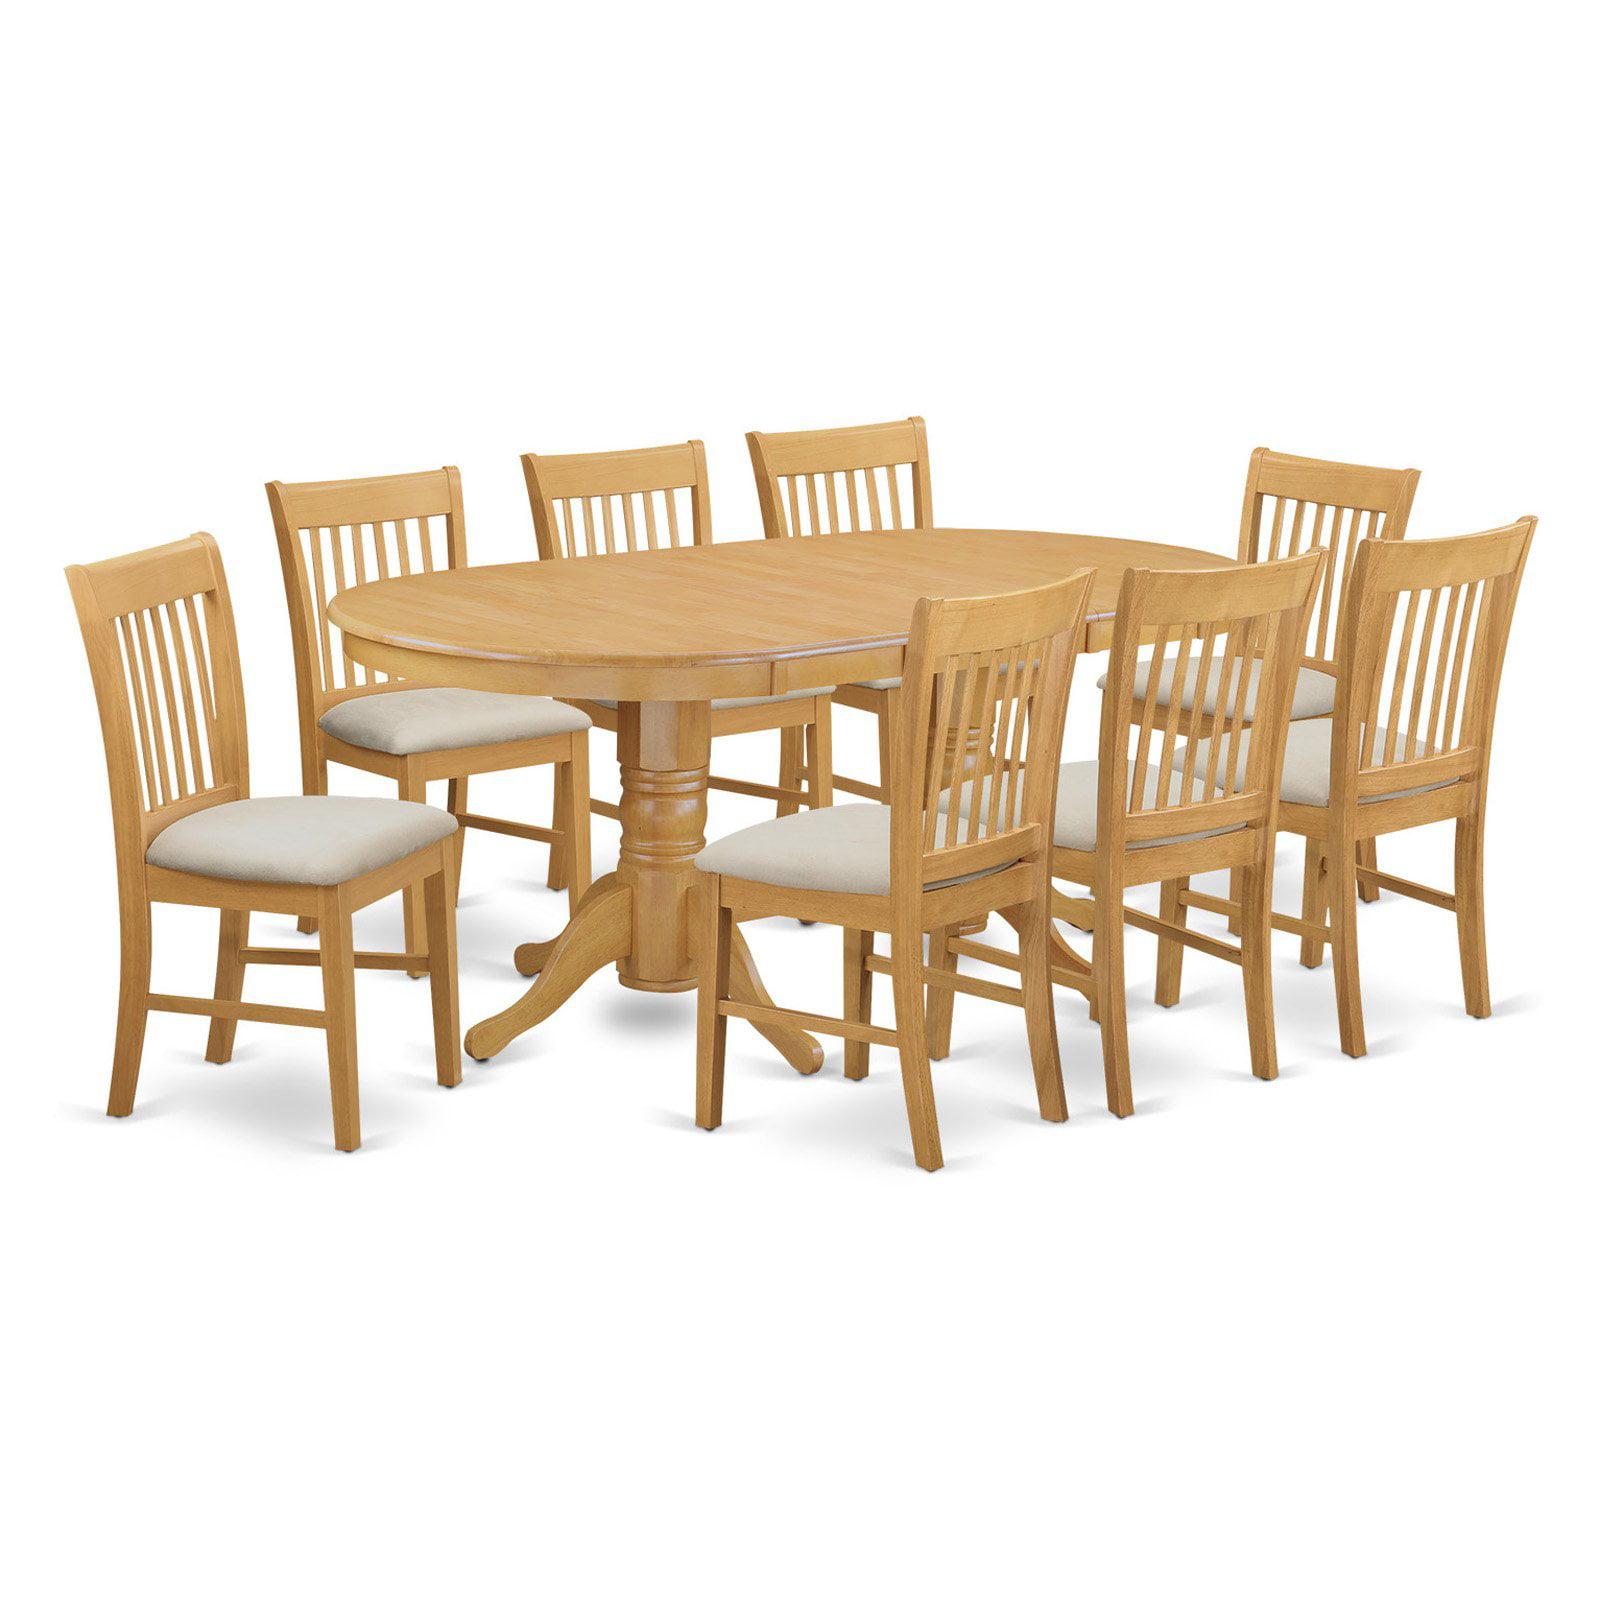 East West Furniture Vancouver 9 Piece Slat Back Dining Table Set